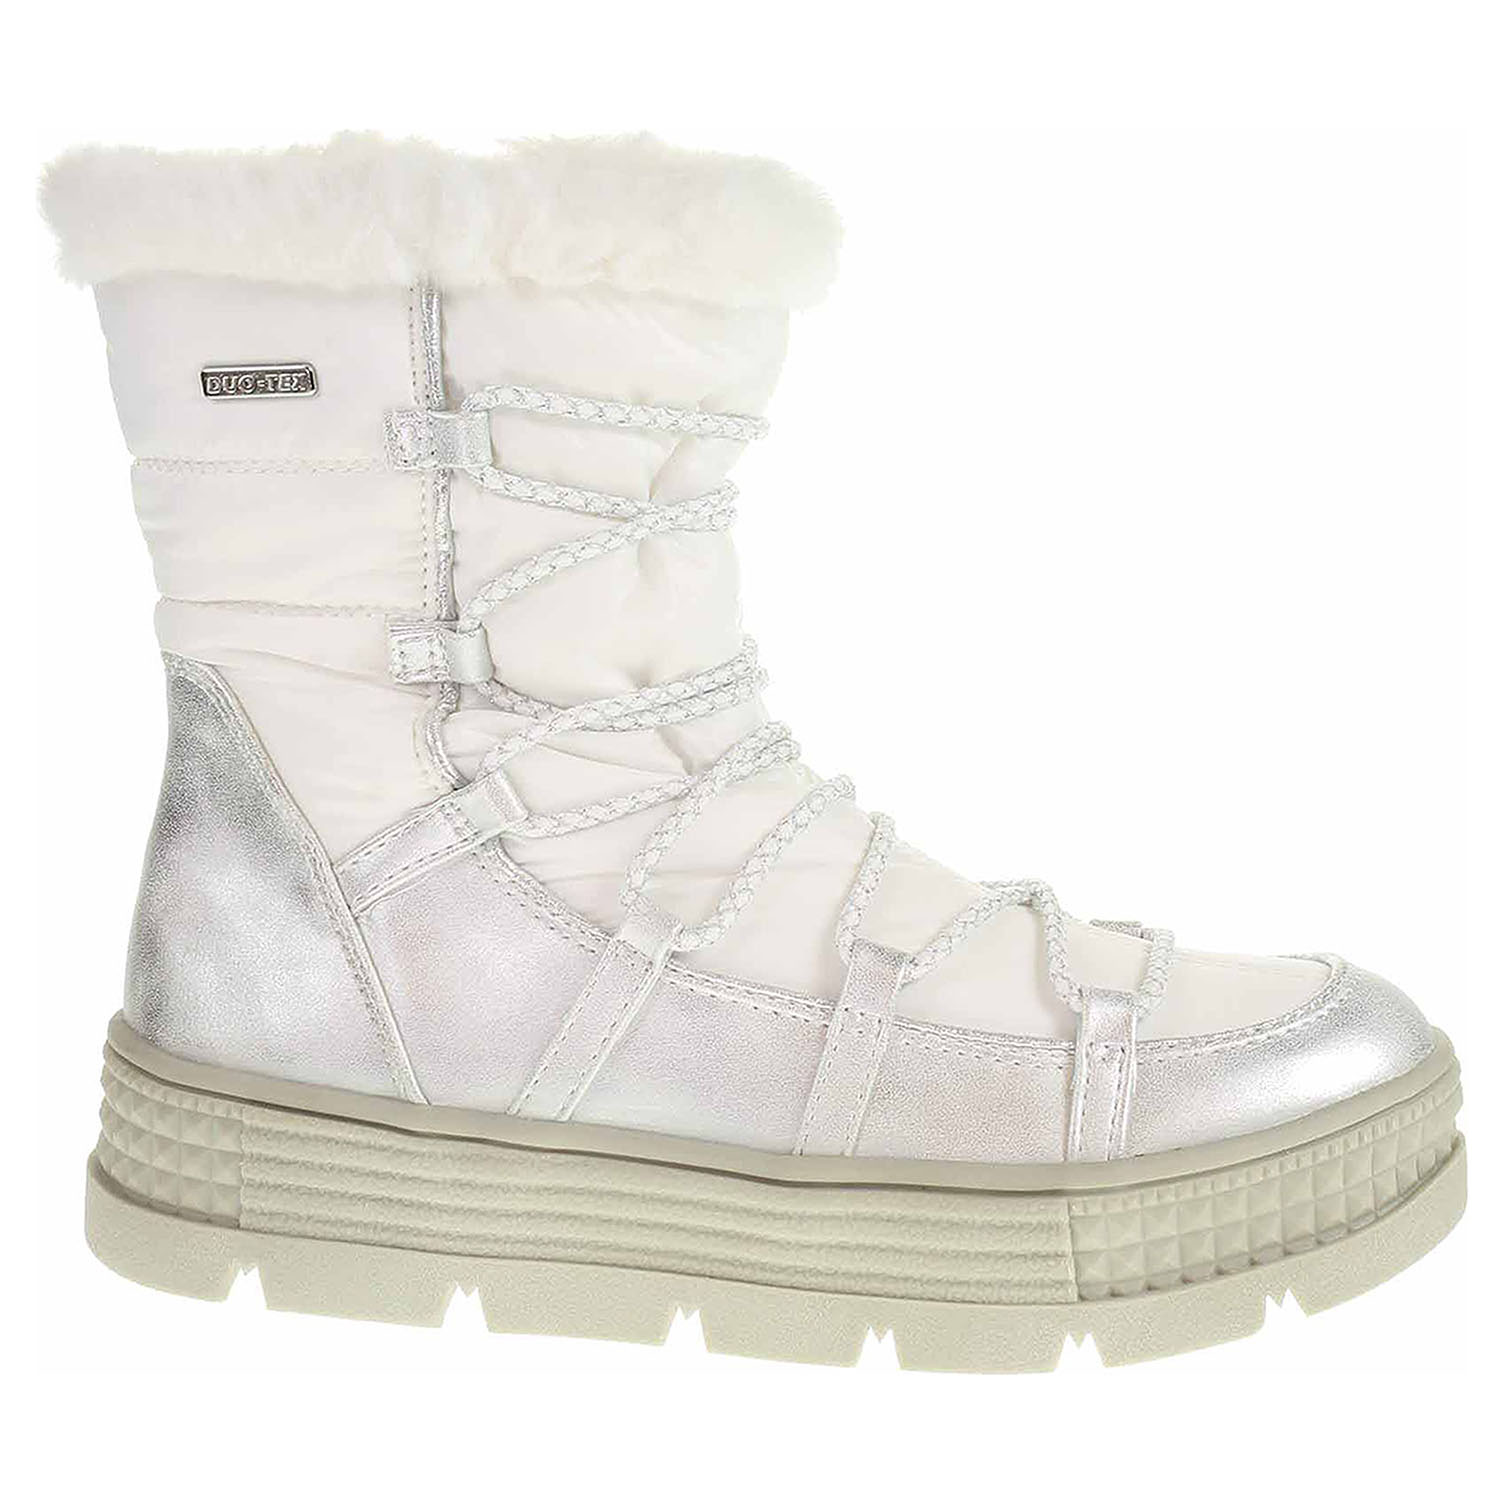 Dámské sněhule Tamaris 1-26431-23 white 1-1-26431-23 100 39